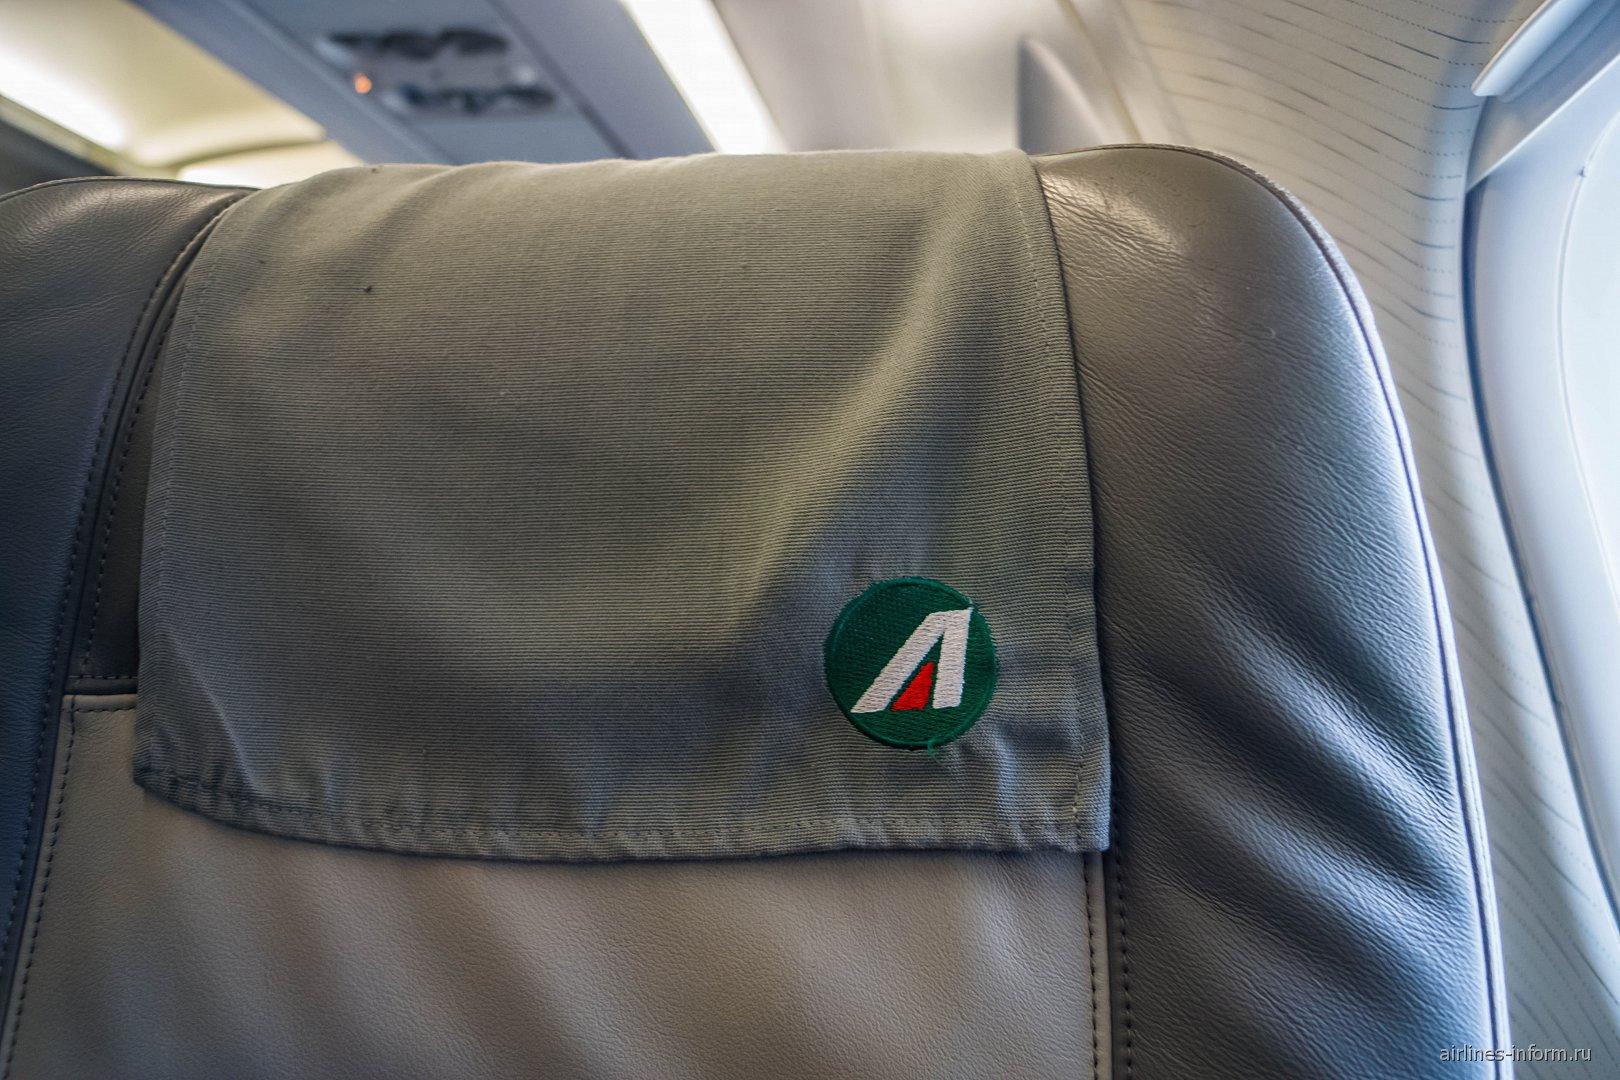 "Вышитый логотип ""Alitalia"" на подголовнике кресла"